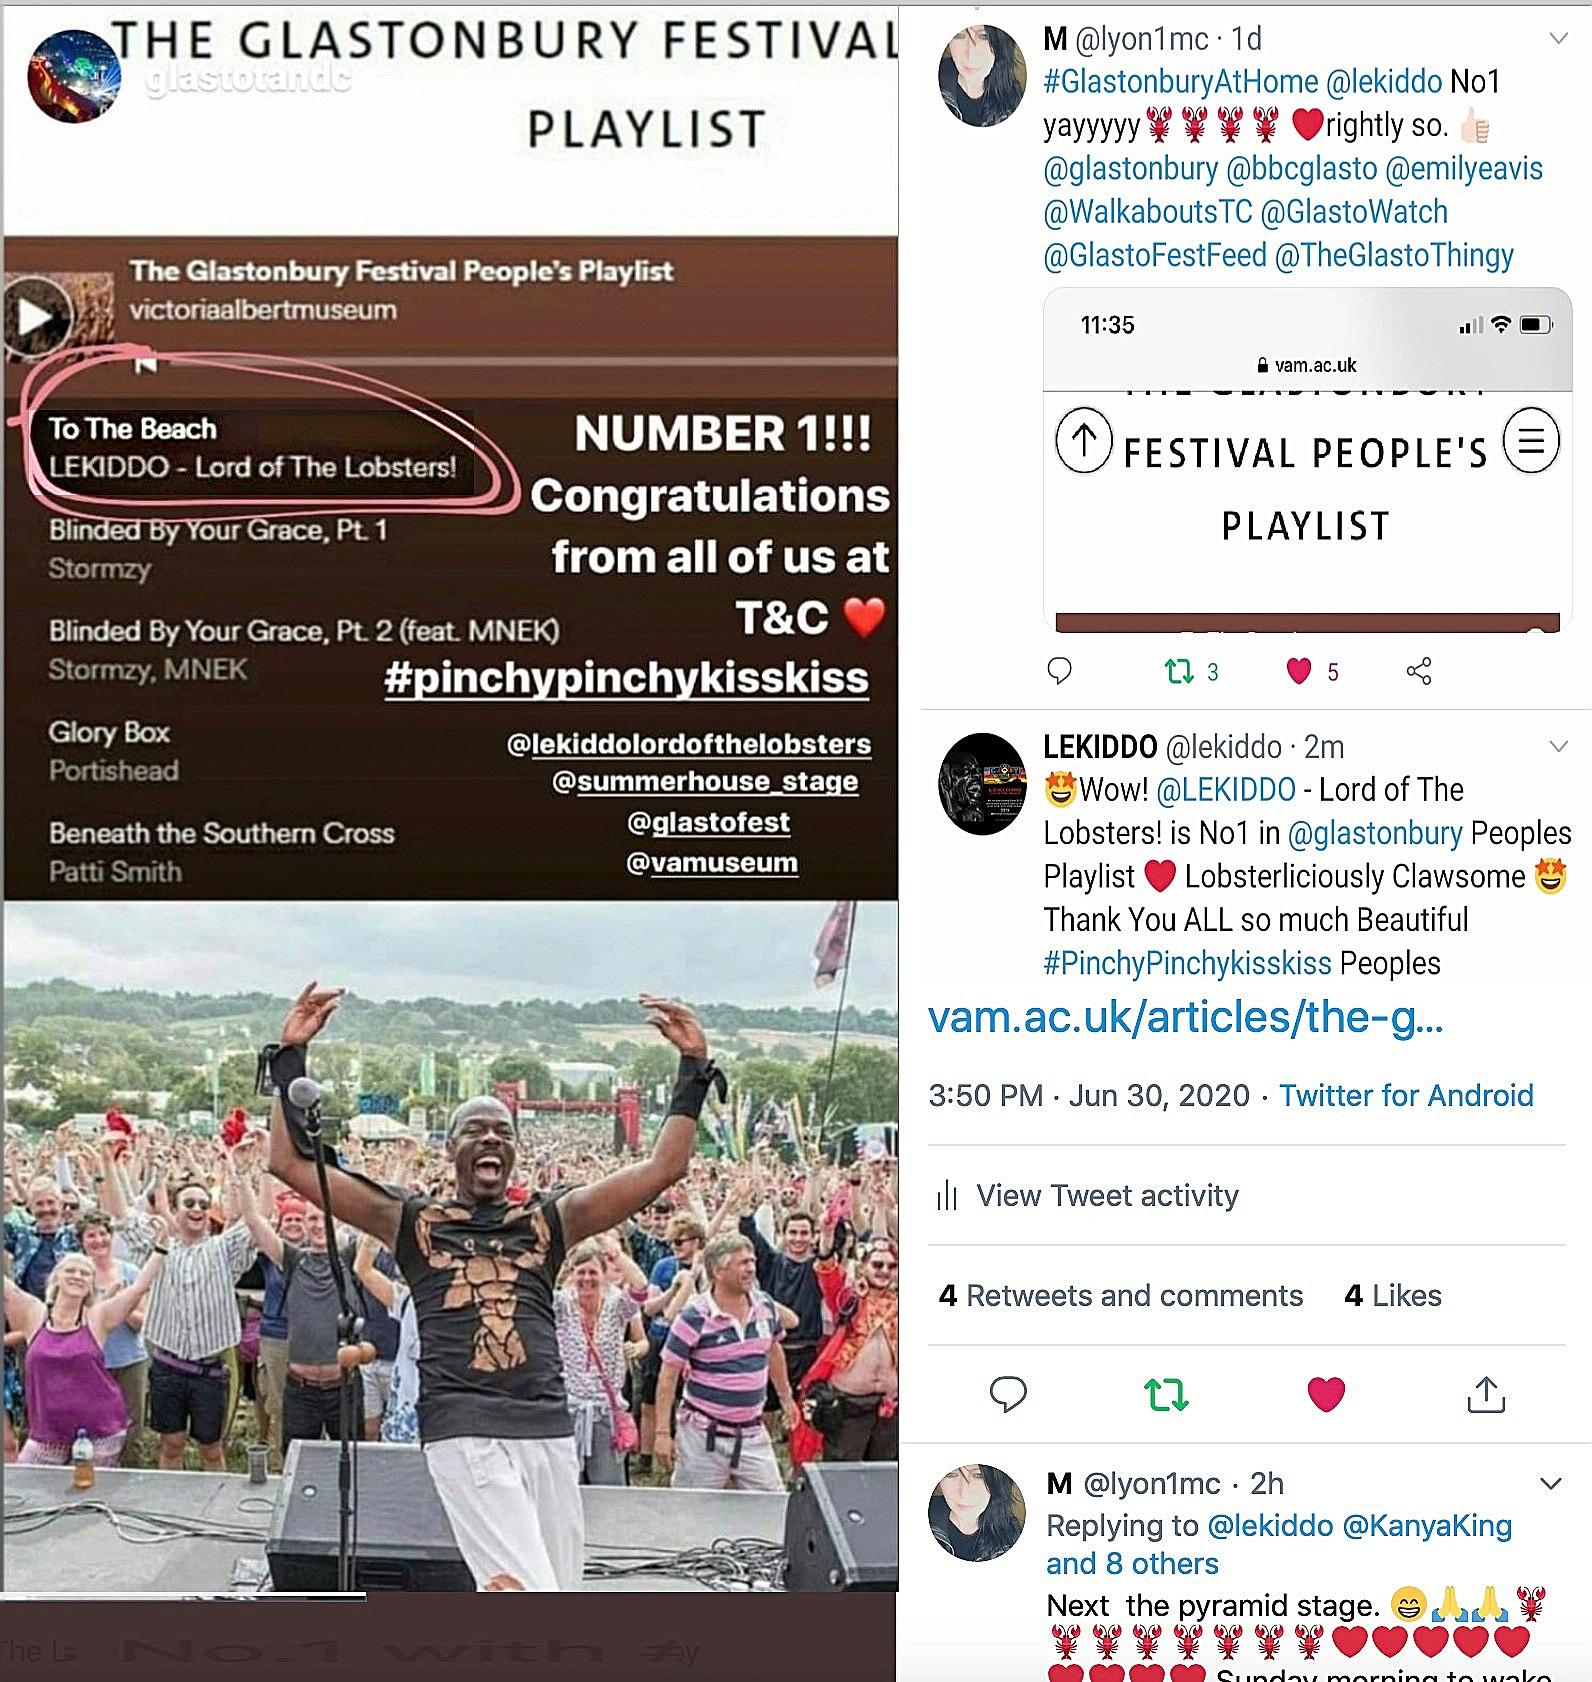 LEKIDDO – Lord of The Lobsters! Number 1 !!!! Congratulatiosn from all of Us at T&C #PinchyPinchykisskiss @lekiddolordofthelobsters @glastotanc @summerhouse_stage @vamuseum @glastonbury @glastofest